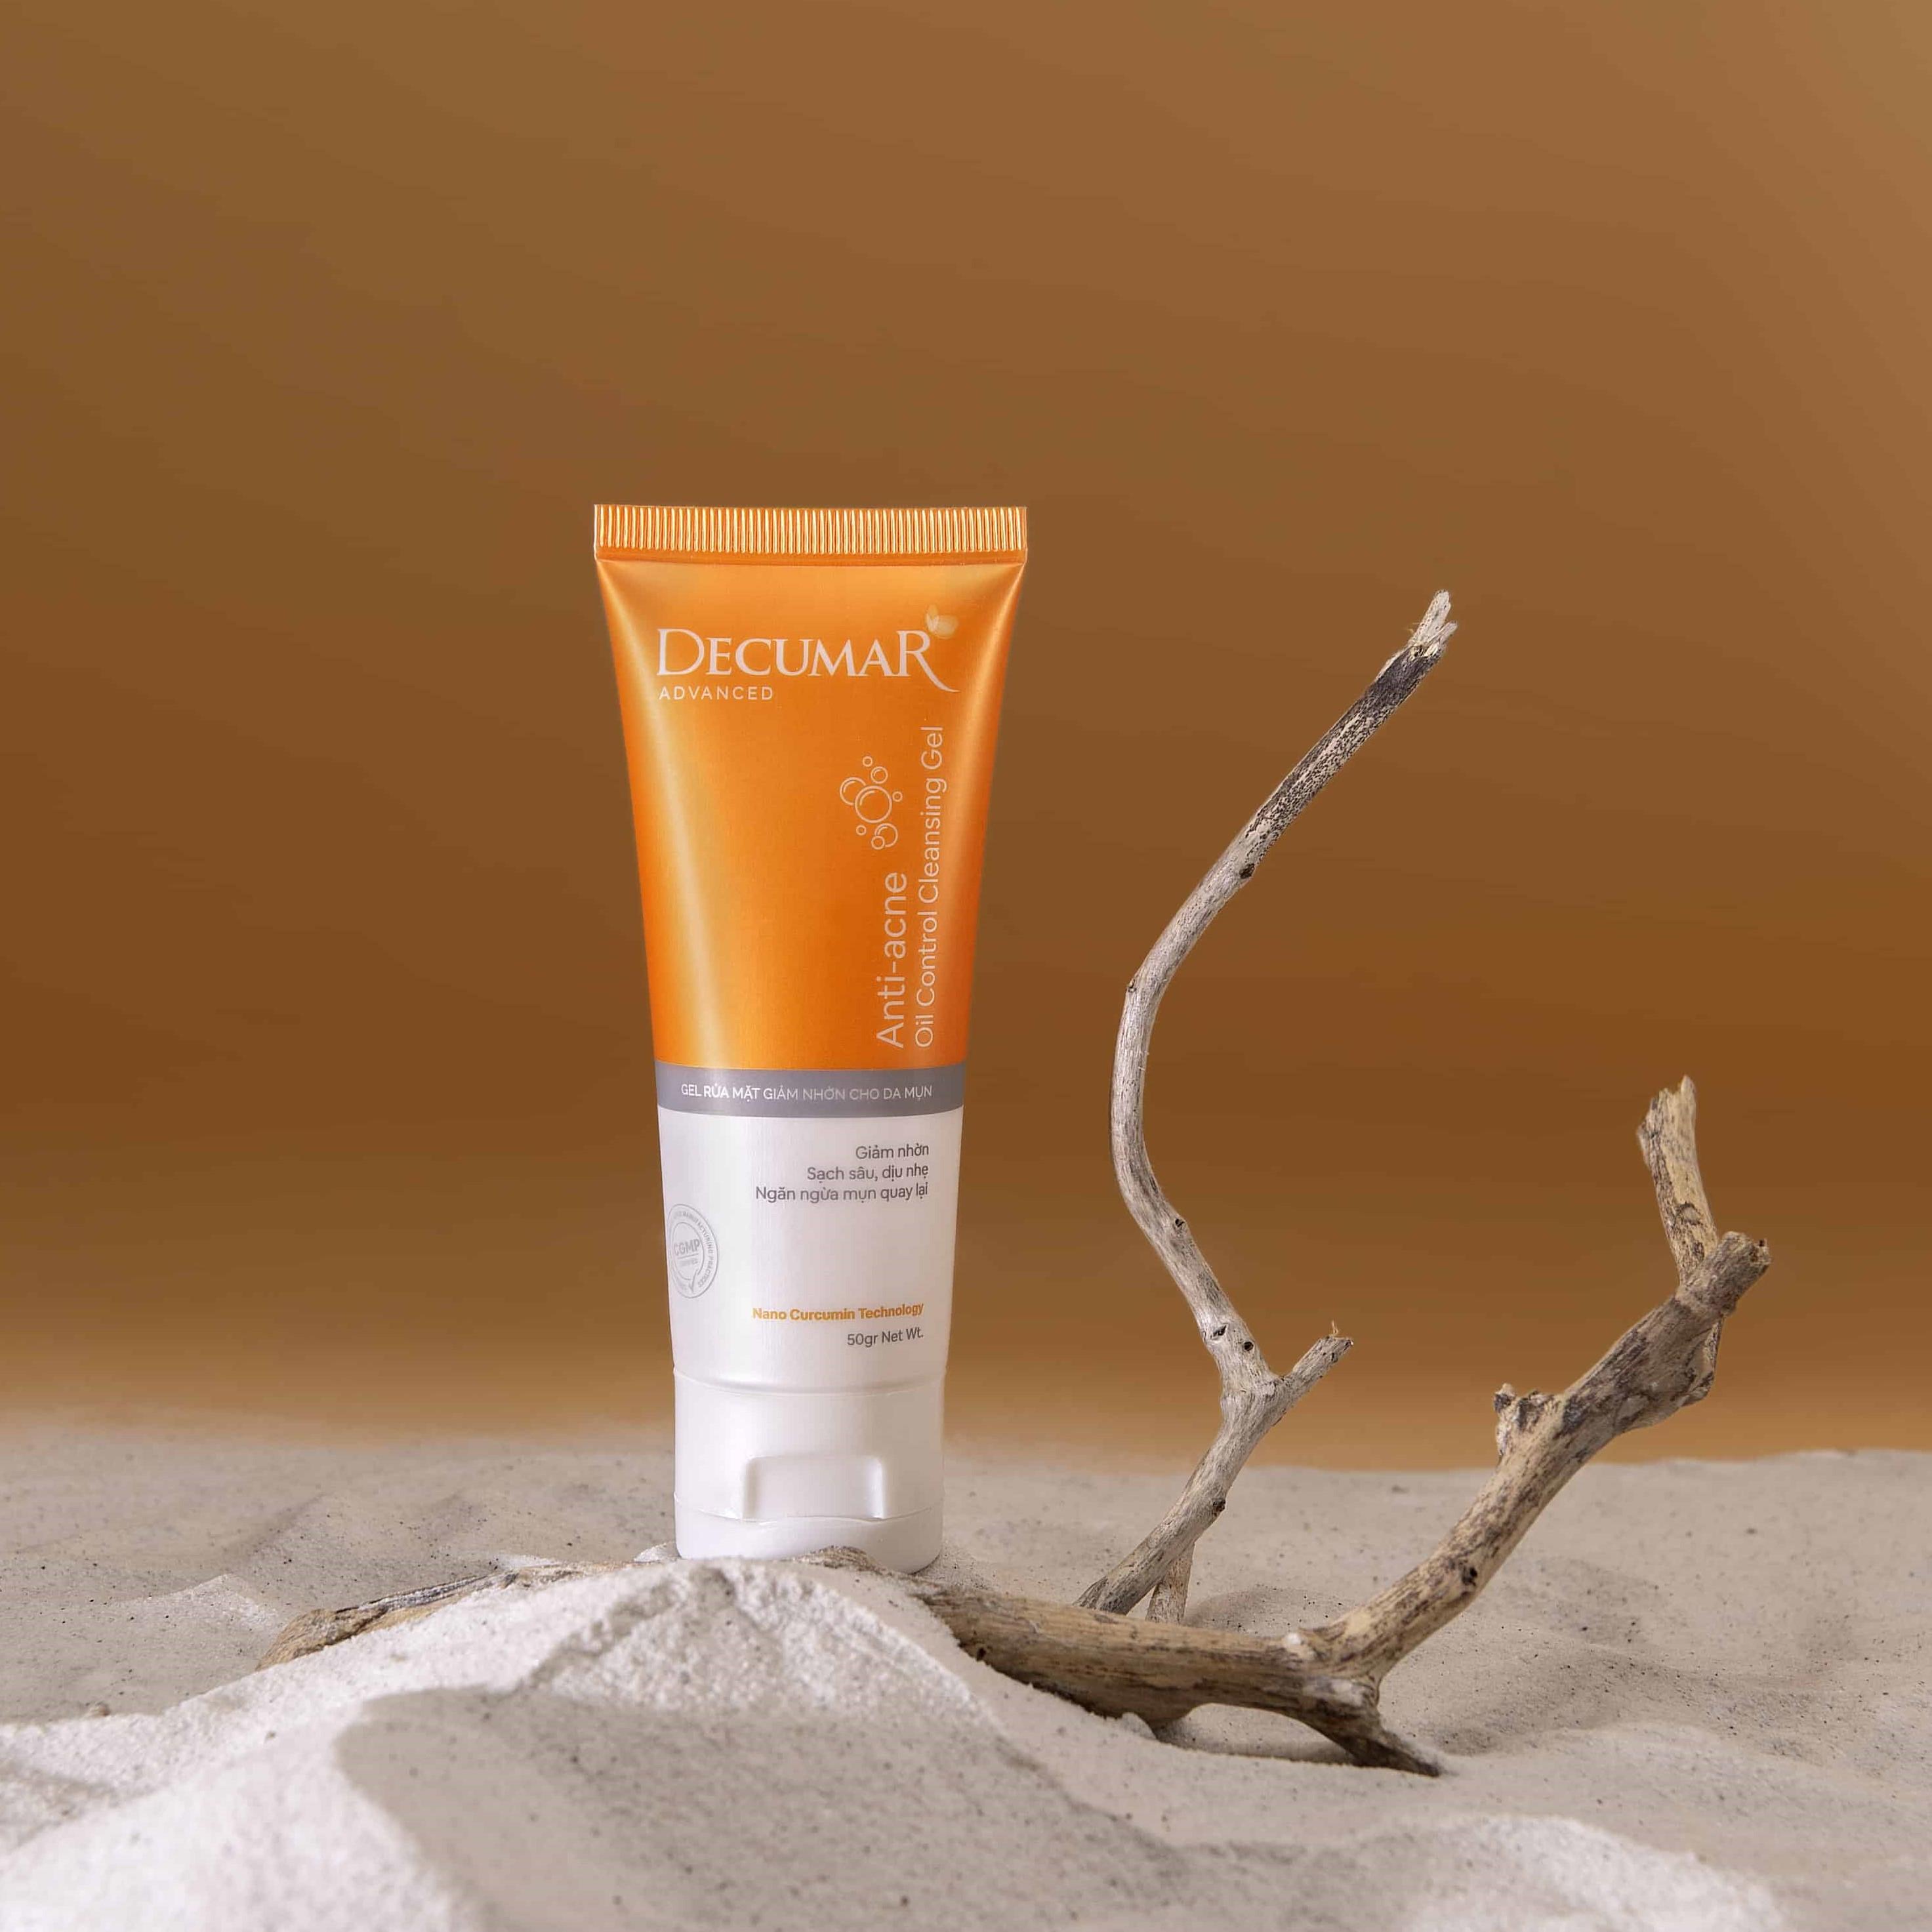 Gel rửa mặt giảm nhờn dành cho da mụn Decumar Advanced – 50g